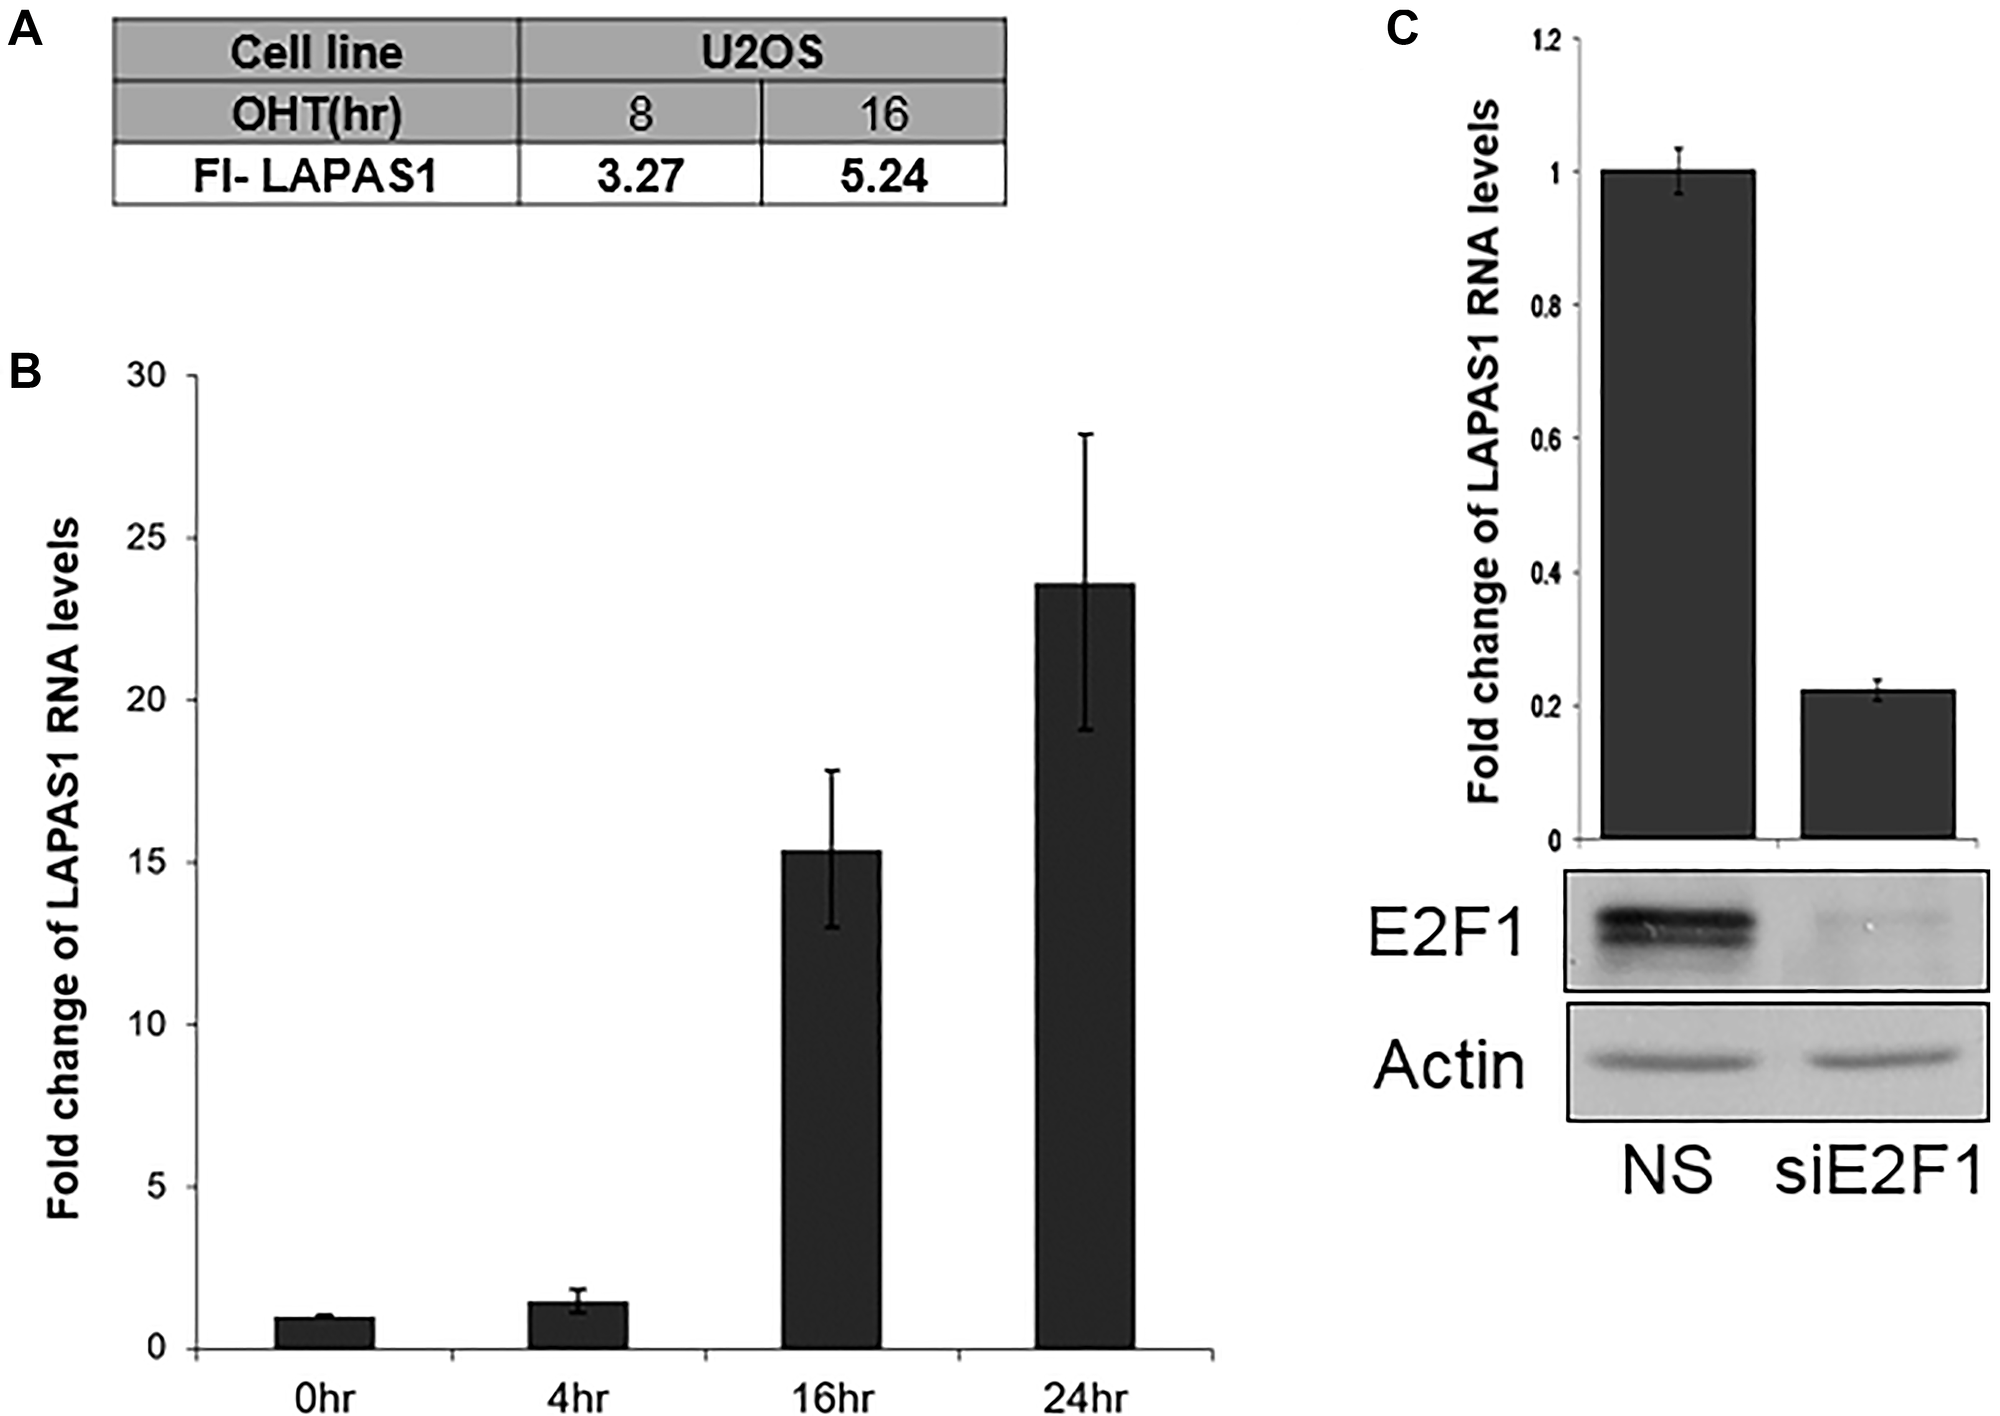 E2F1 regulates LAPAS1 RNA levels.